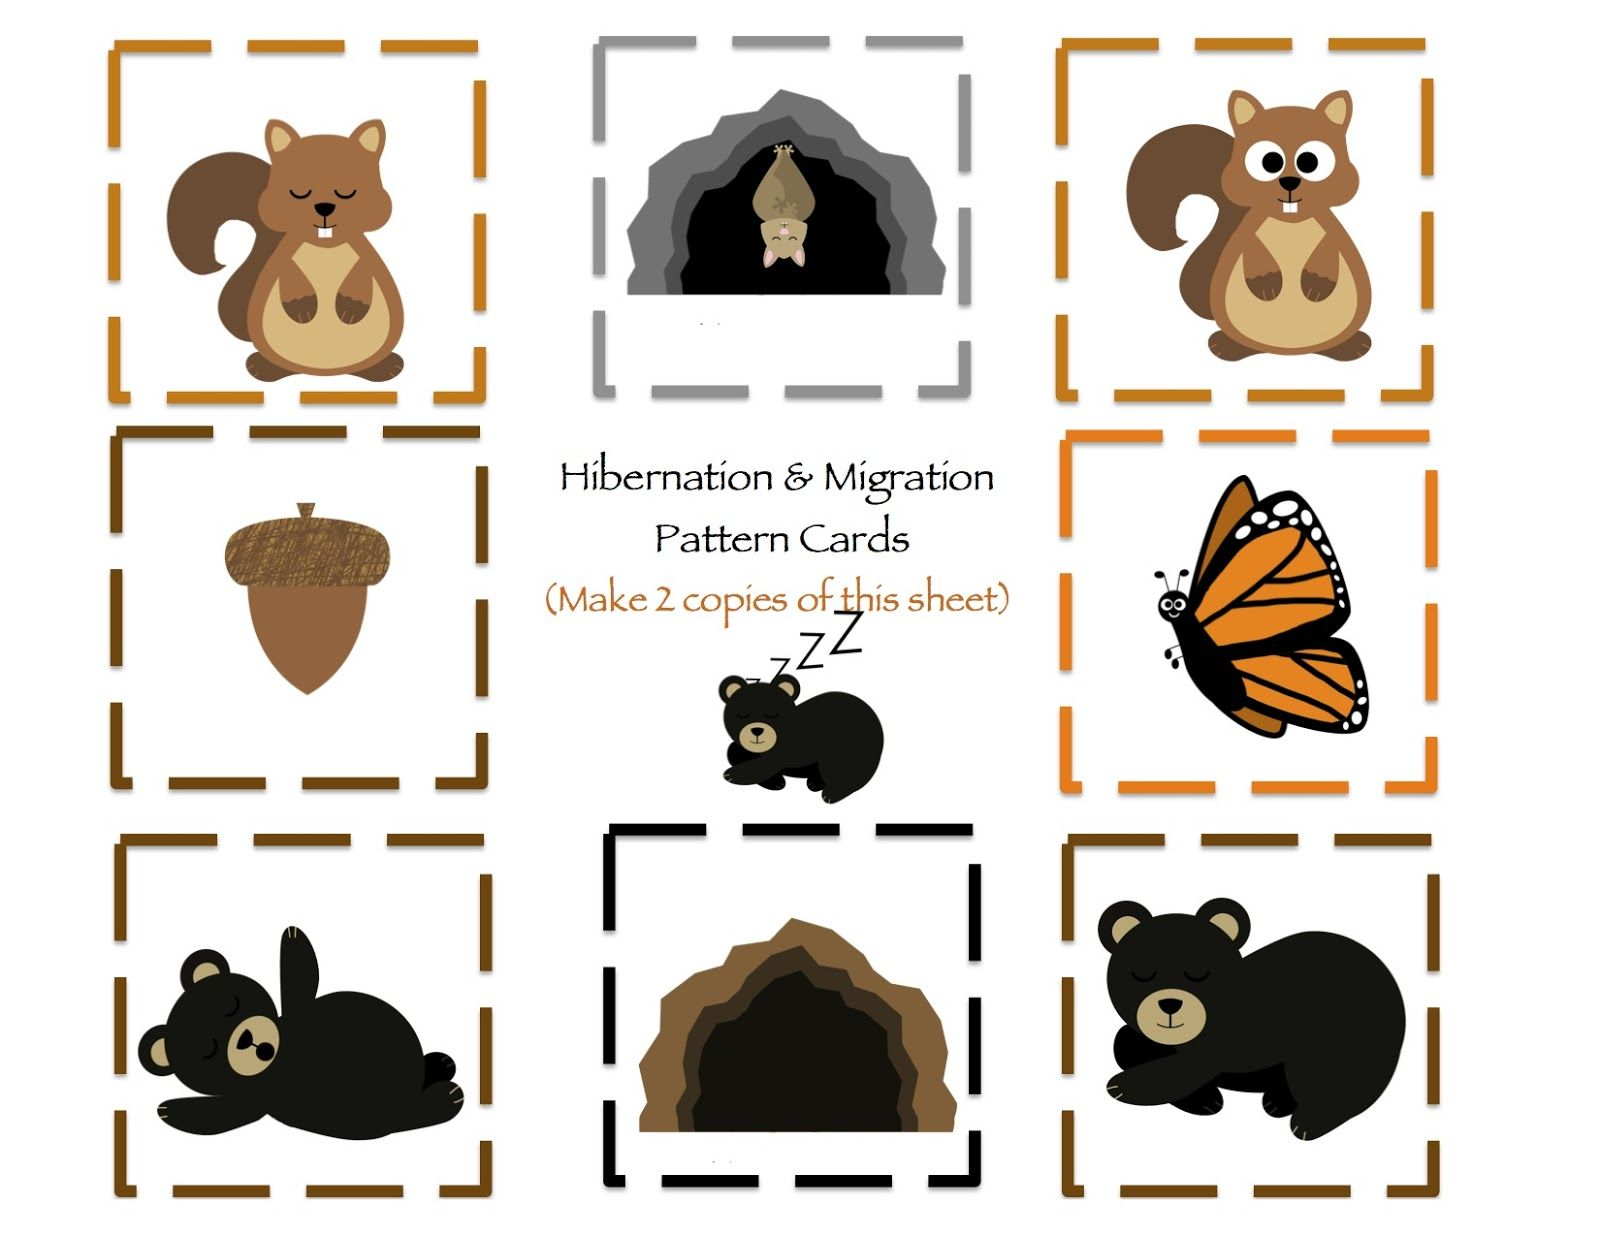 worksheet Hibernation Worksheets hibernation migration printable preschool printables activities printables